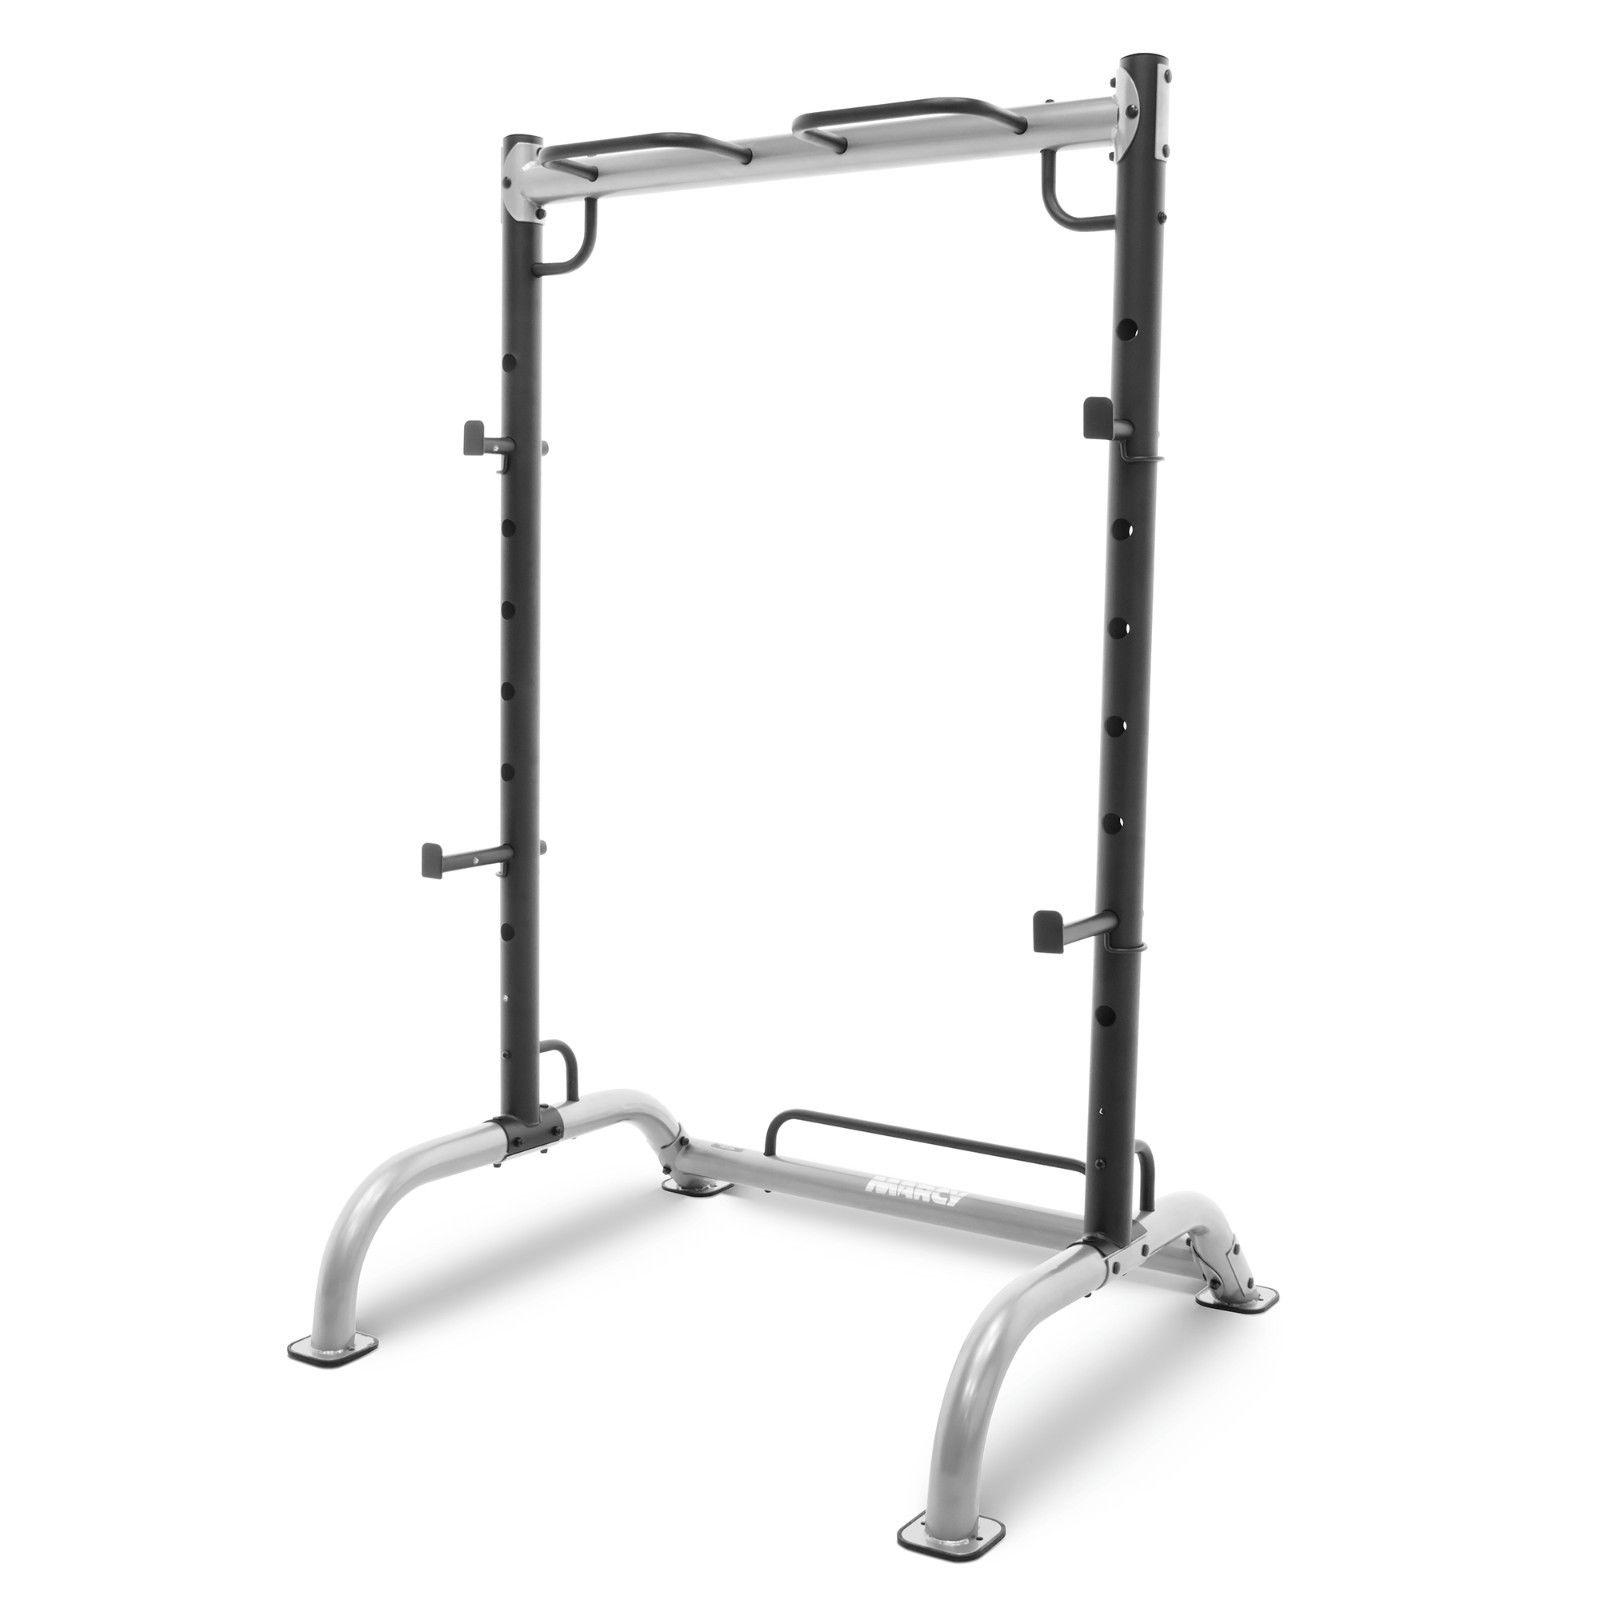 Power Rack Deadlift: MWB-70500 Squat Lift Cage Deadlift Bench